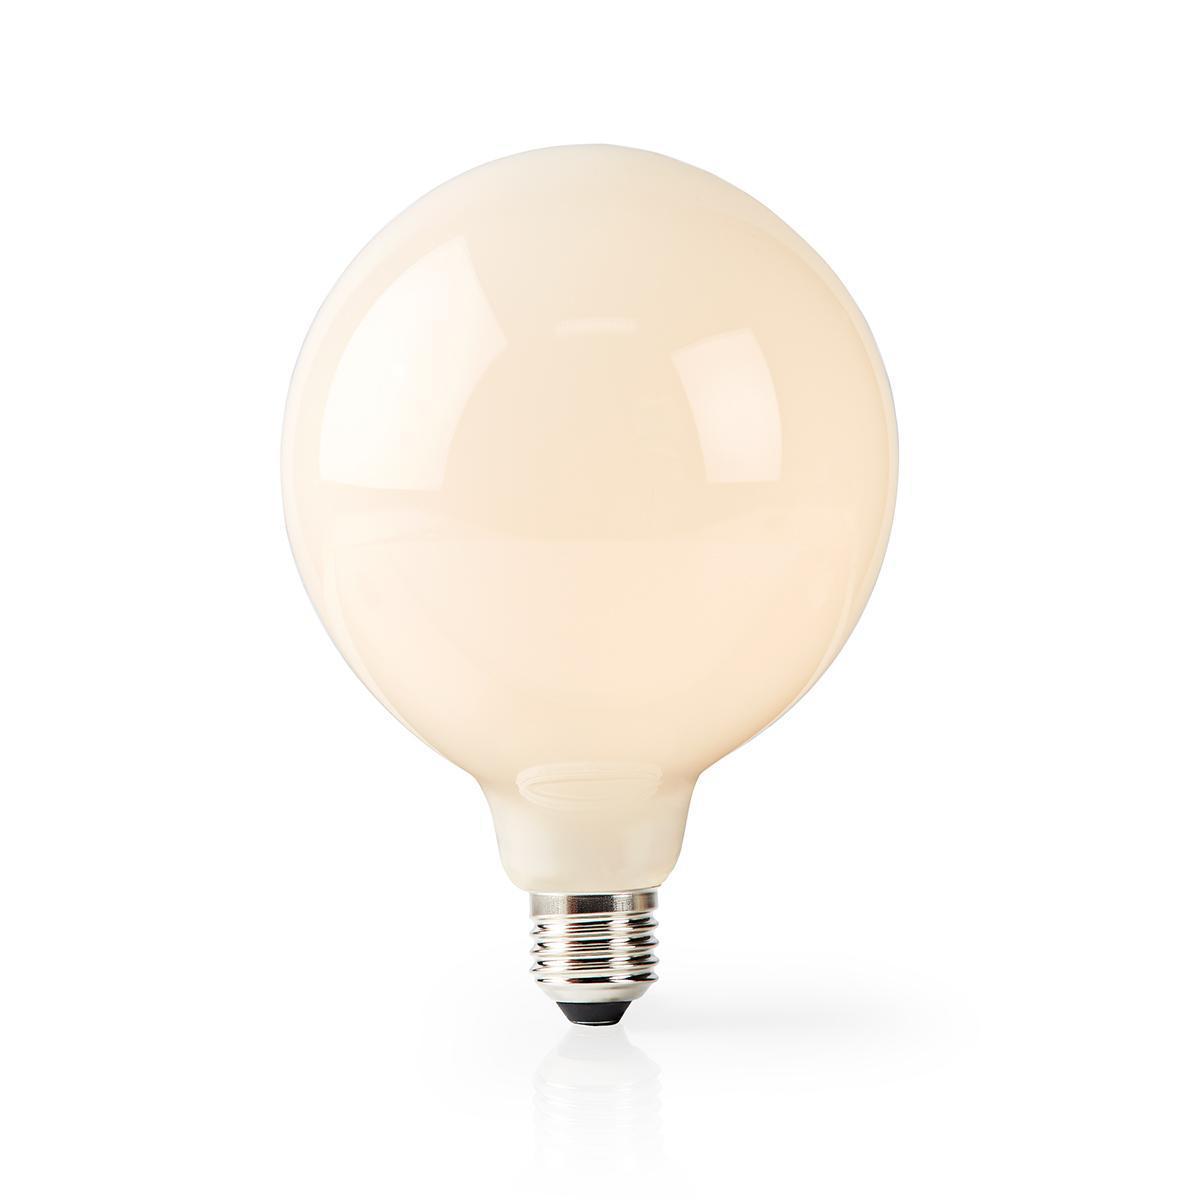 Smart lamp globe Led Lamp 5 Watt 2700K - Warm wit - lamp aan